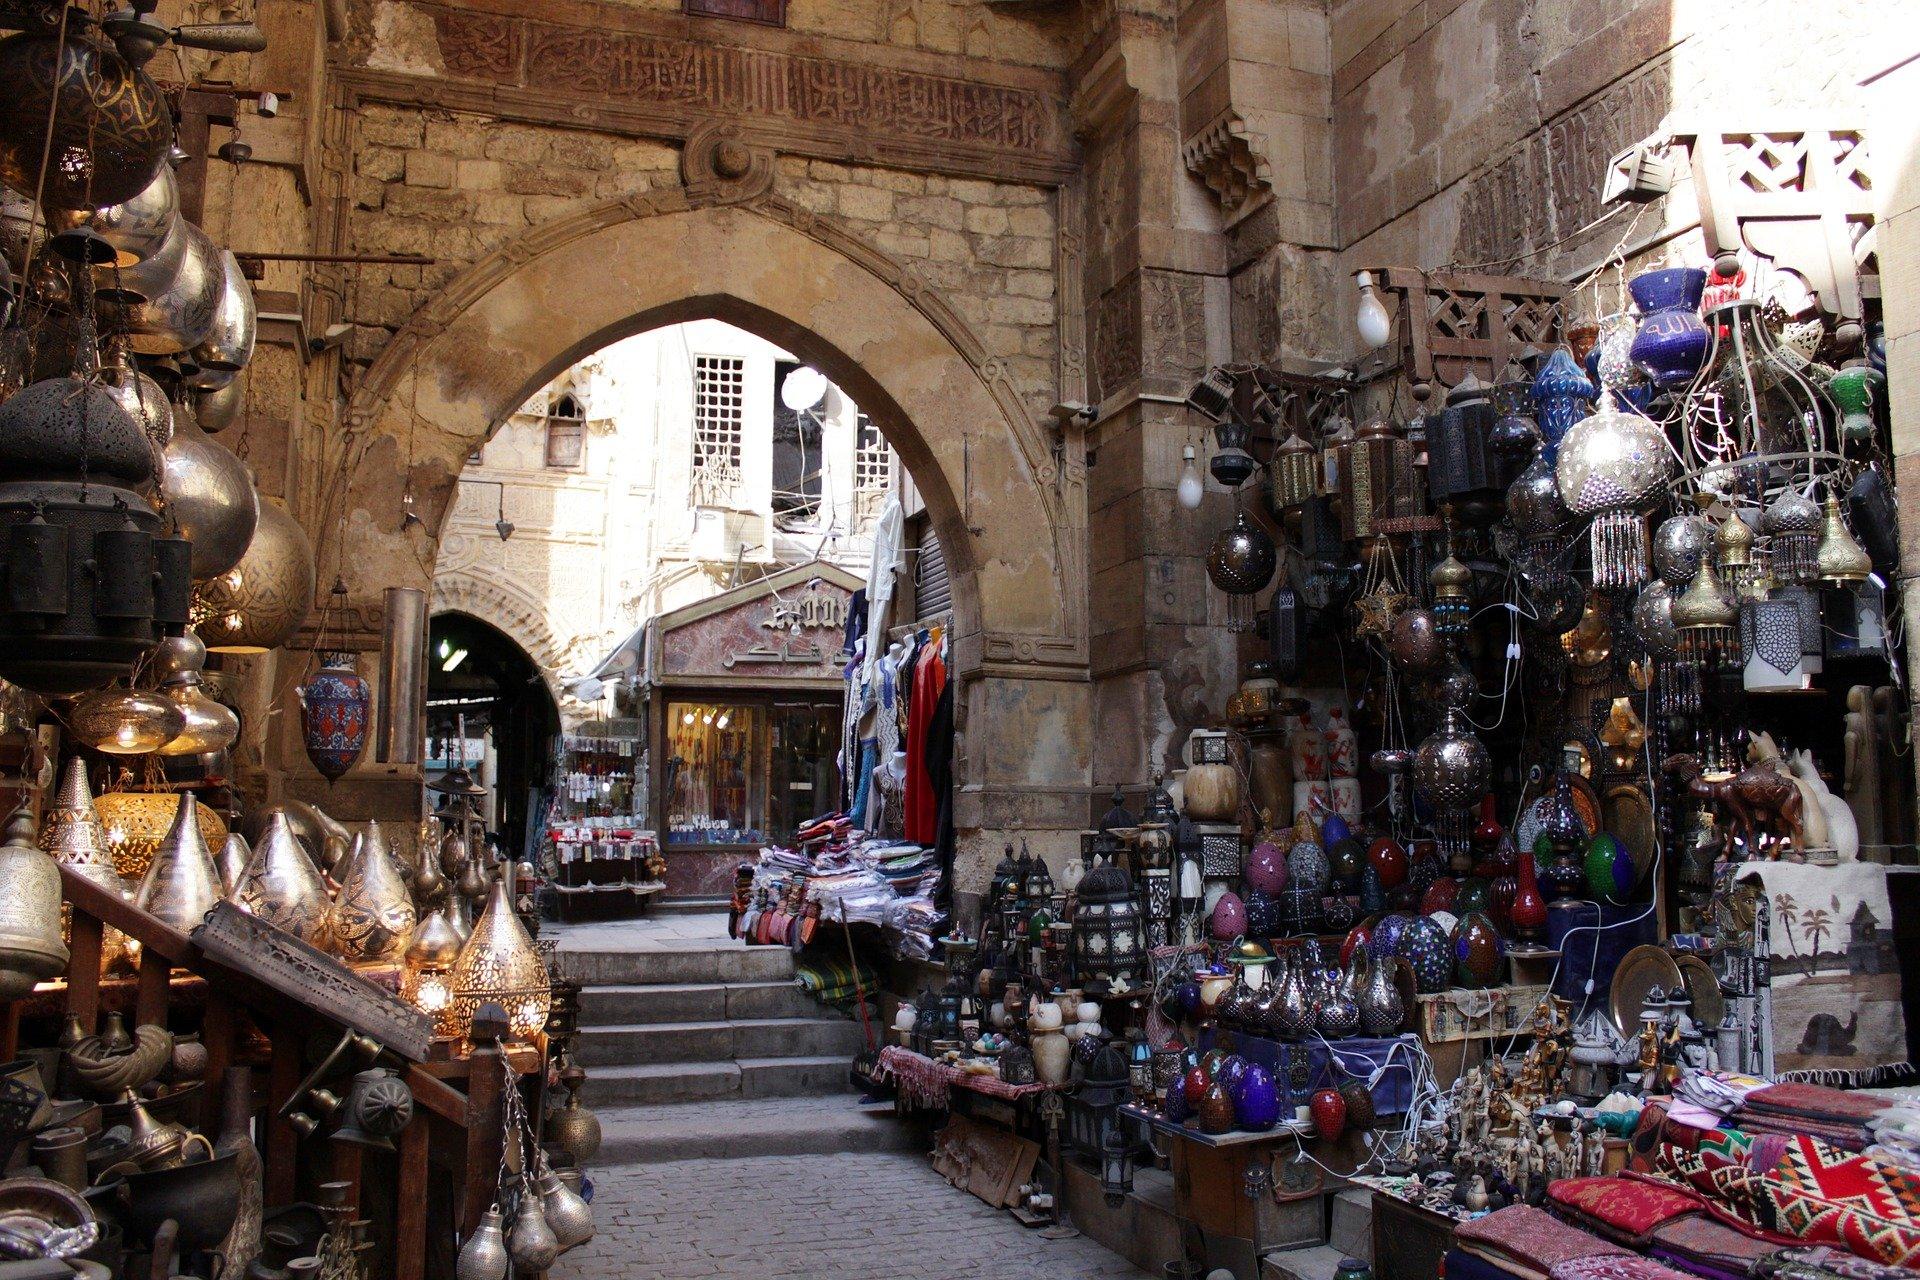 Cairo 2 Day Tour From Sinai